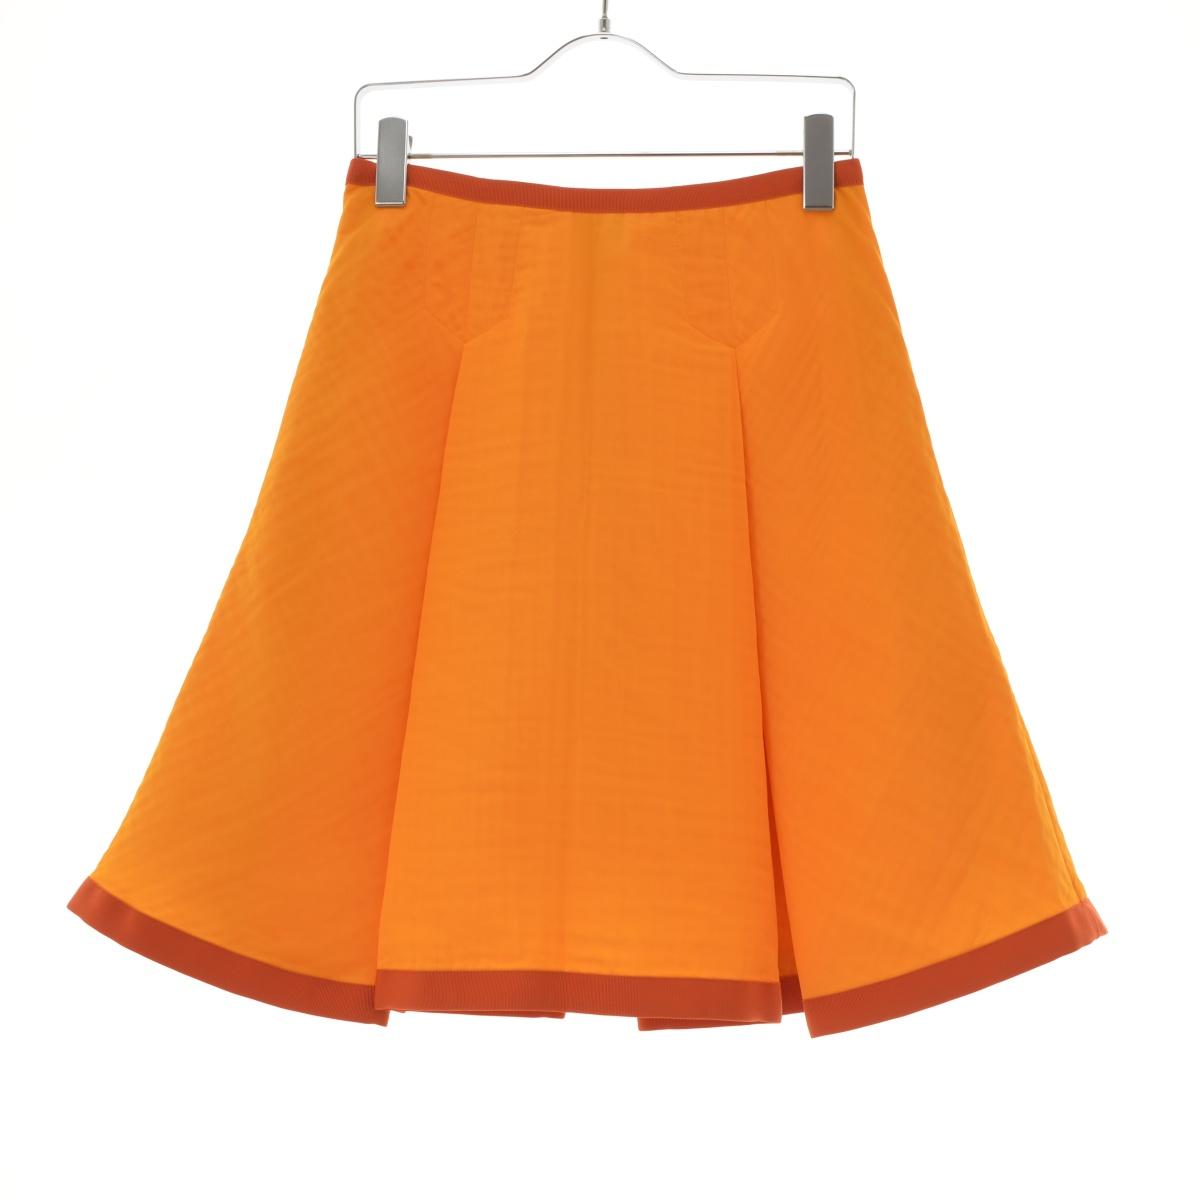 sacai luck / サカイラック15SSLU891 ボックスプリーツフレアスカート【送料無料】【cabibcda-l】